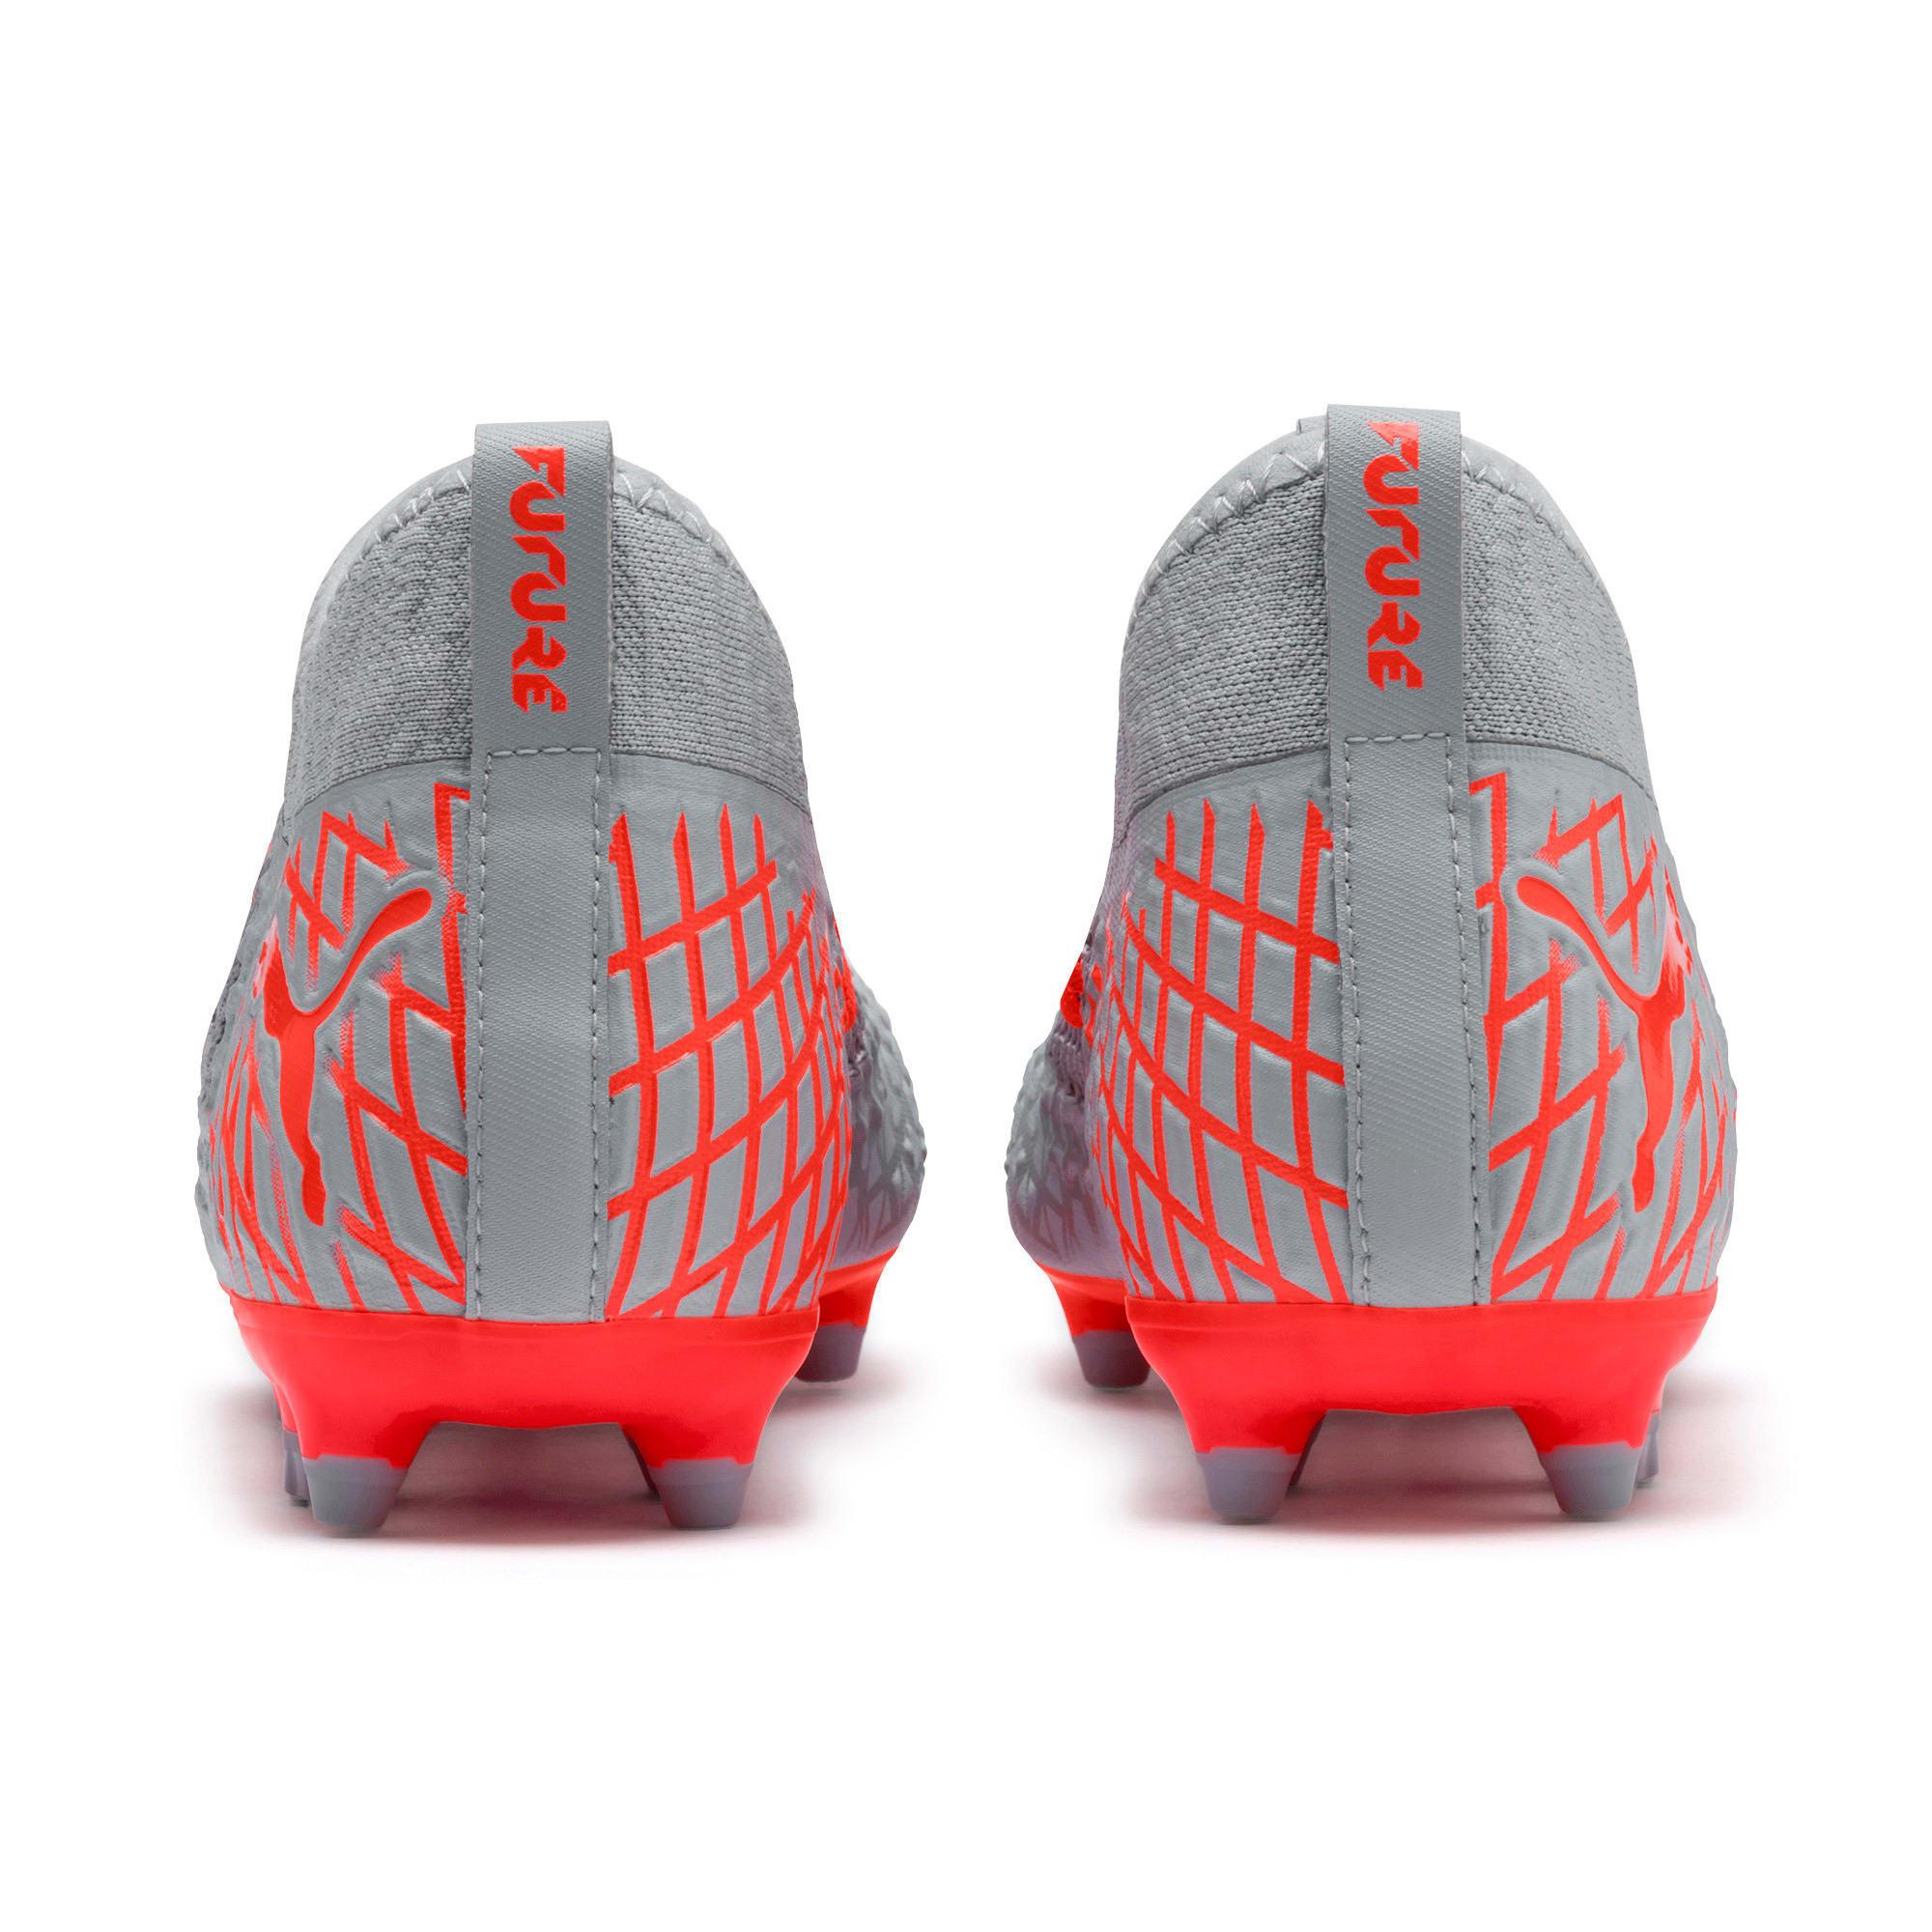 Thumbnail 4 of Chaussure de foot FUTURE 4.3 NETFIT FG/AG pour homme, Glacial Blue-Nrgy Red, medium